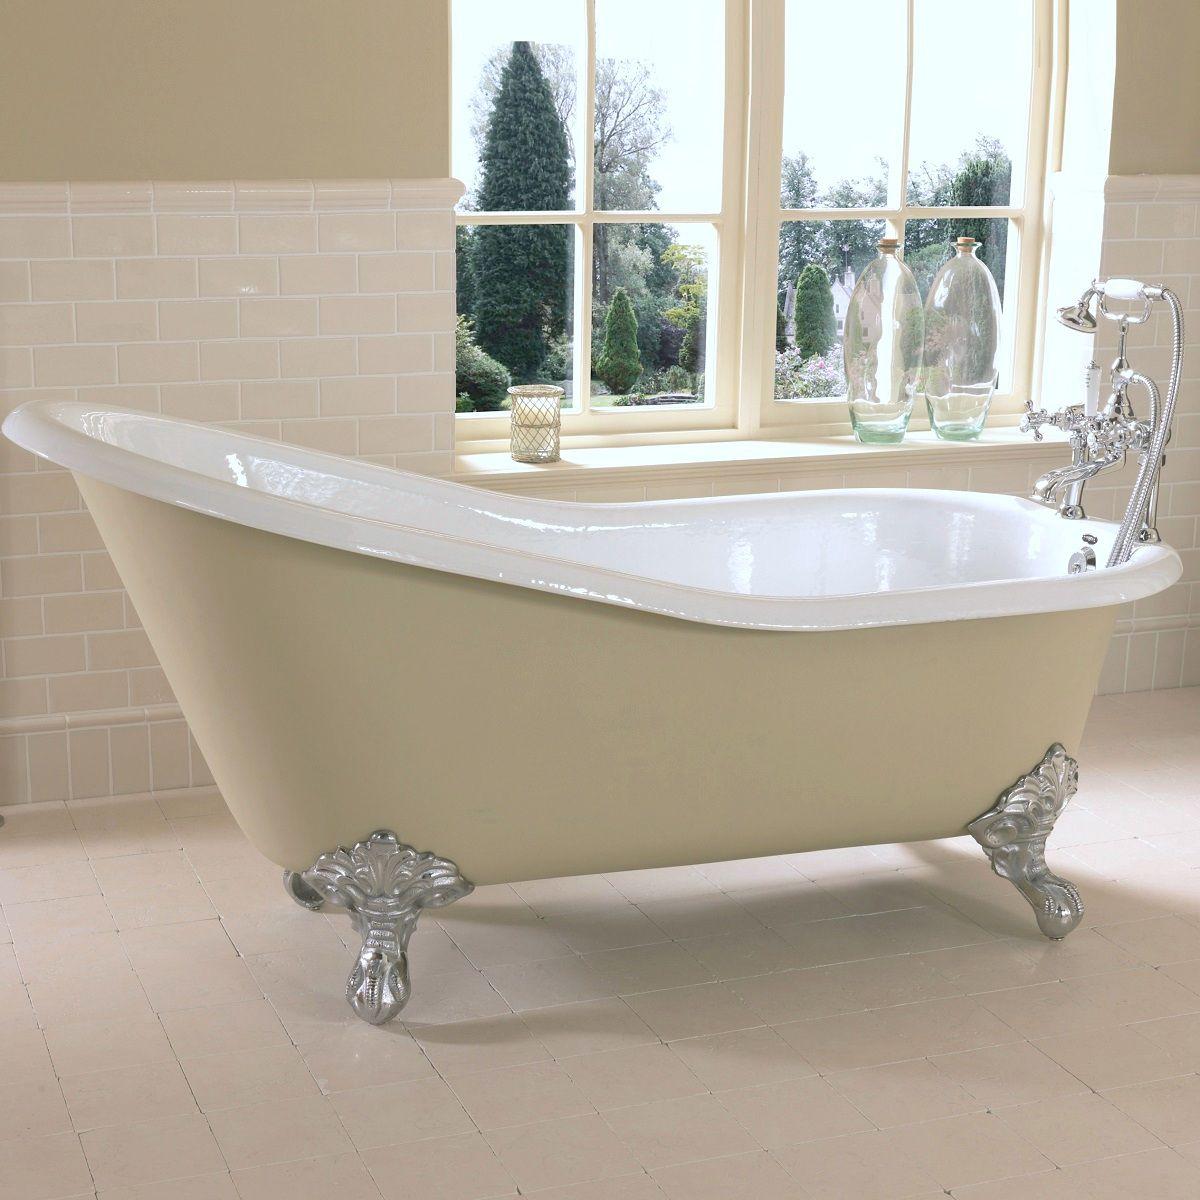 Imperial Ritz Cast Iron Slipper Bath : UK Bathrooms